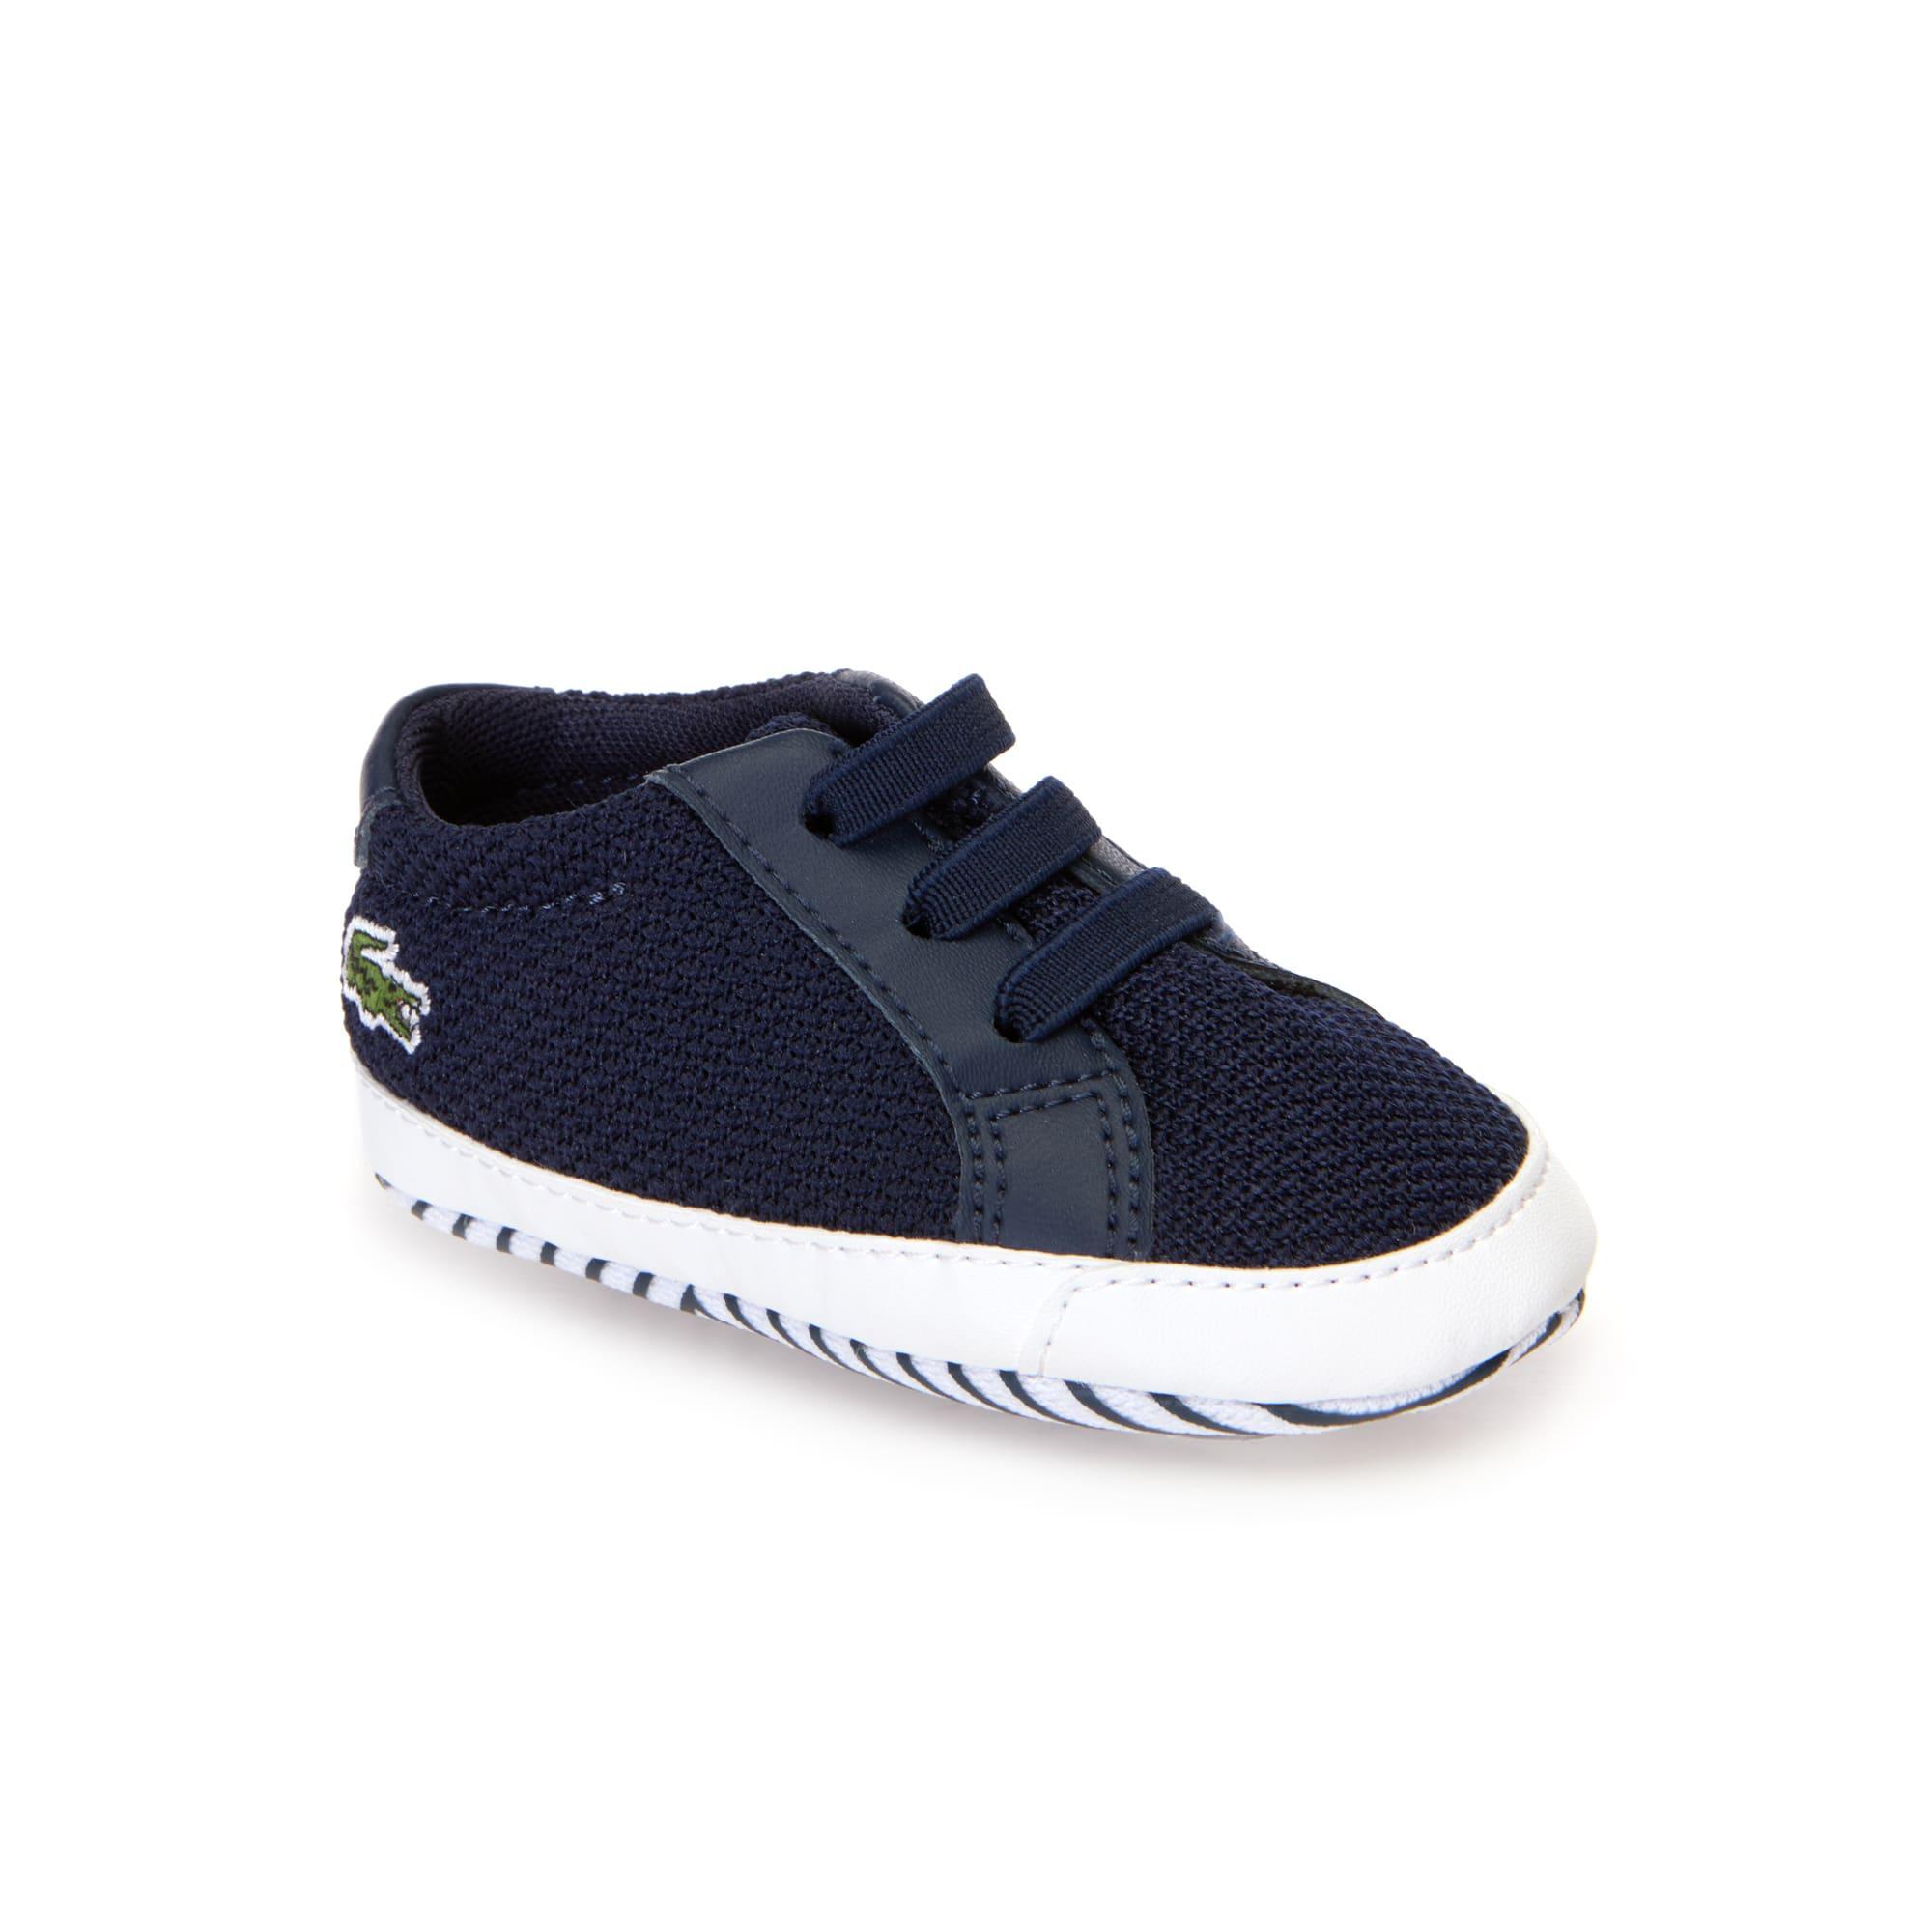 Sneakers L.12.12 Crib bébé en textile